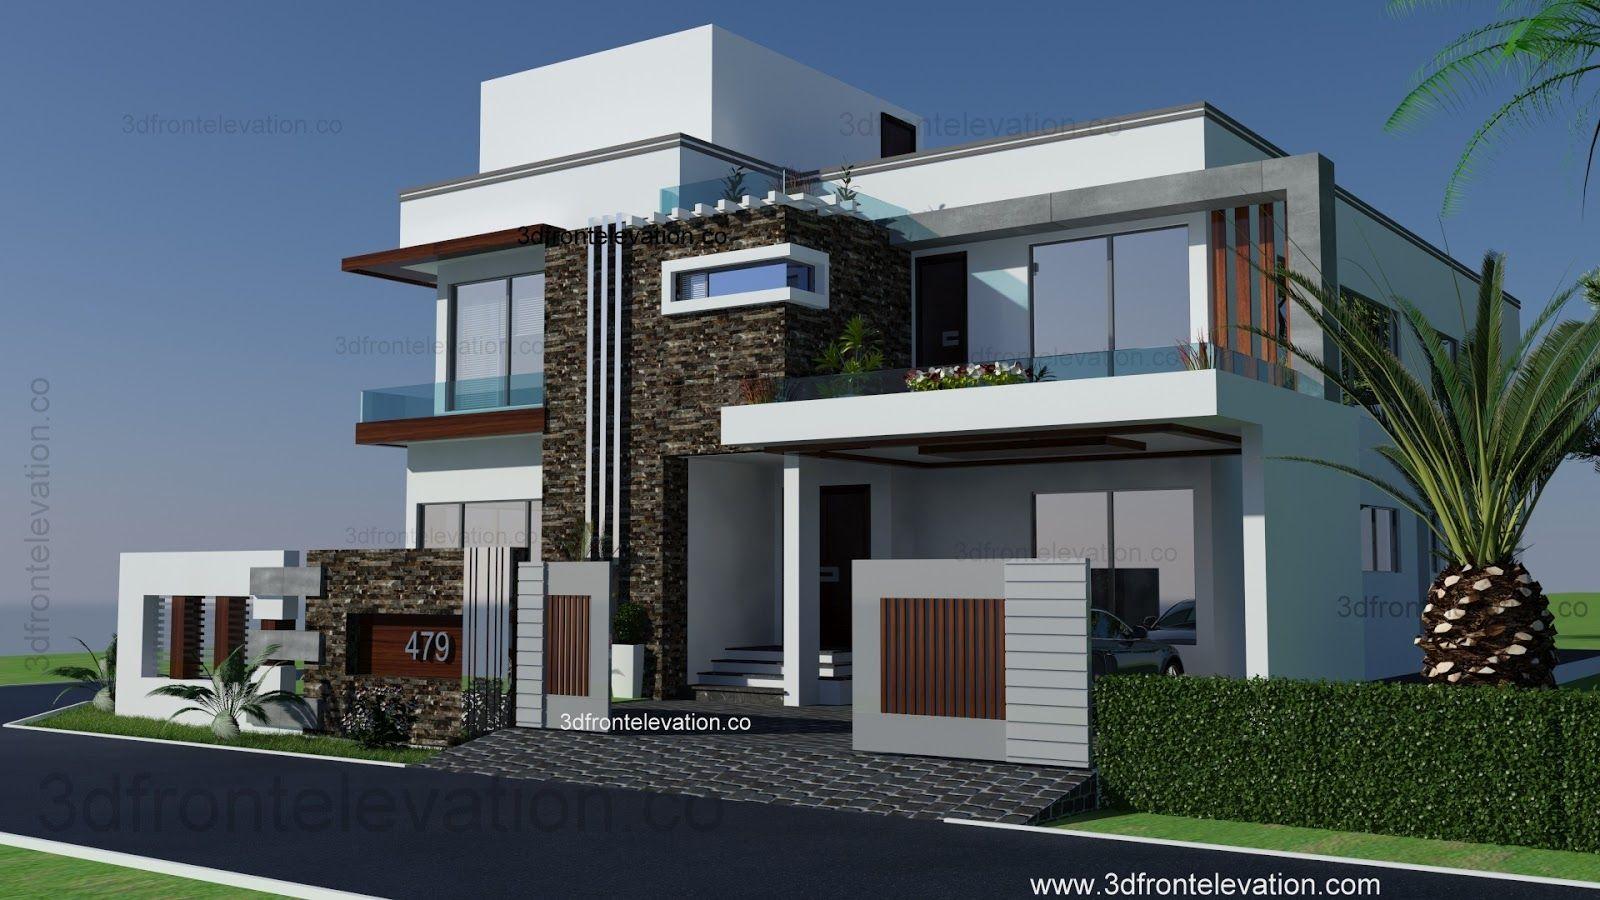 Sample Of Front Elevation : D front elevation portfolio exteriors pinterest